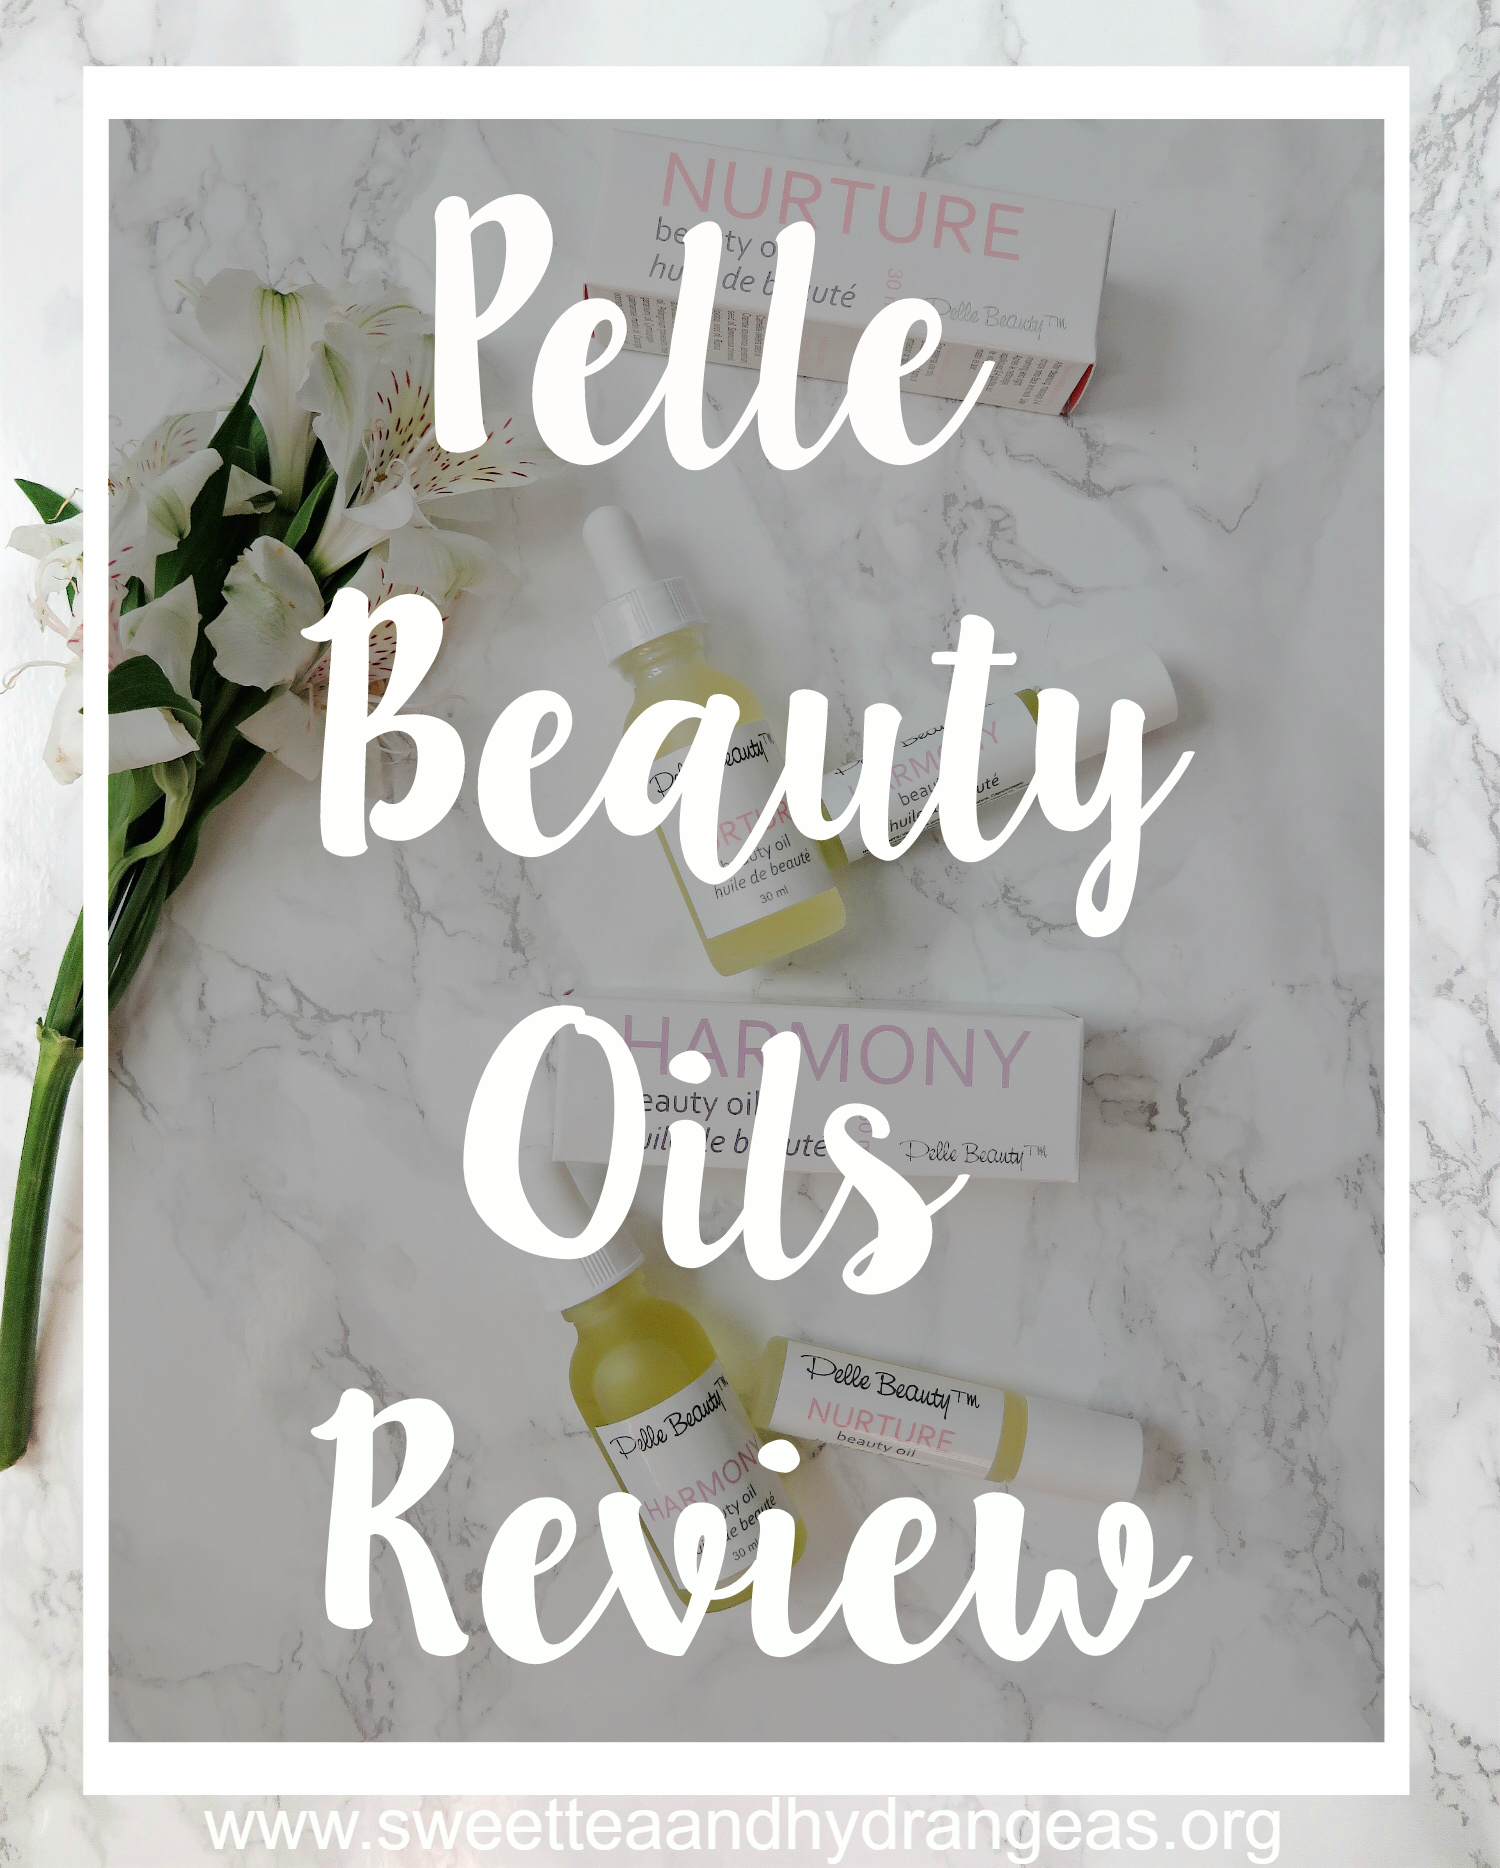 @sweetteaandhydrangeas's cover photo for 'Pelle Beauty Oils Review'